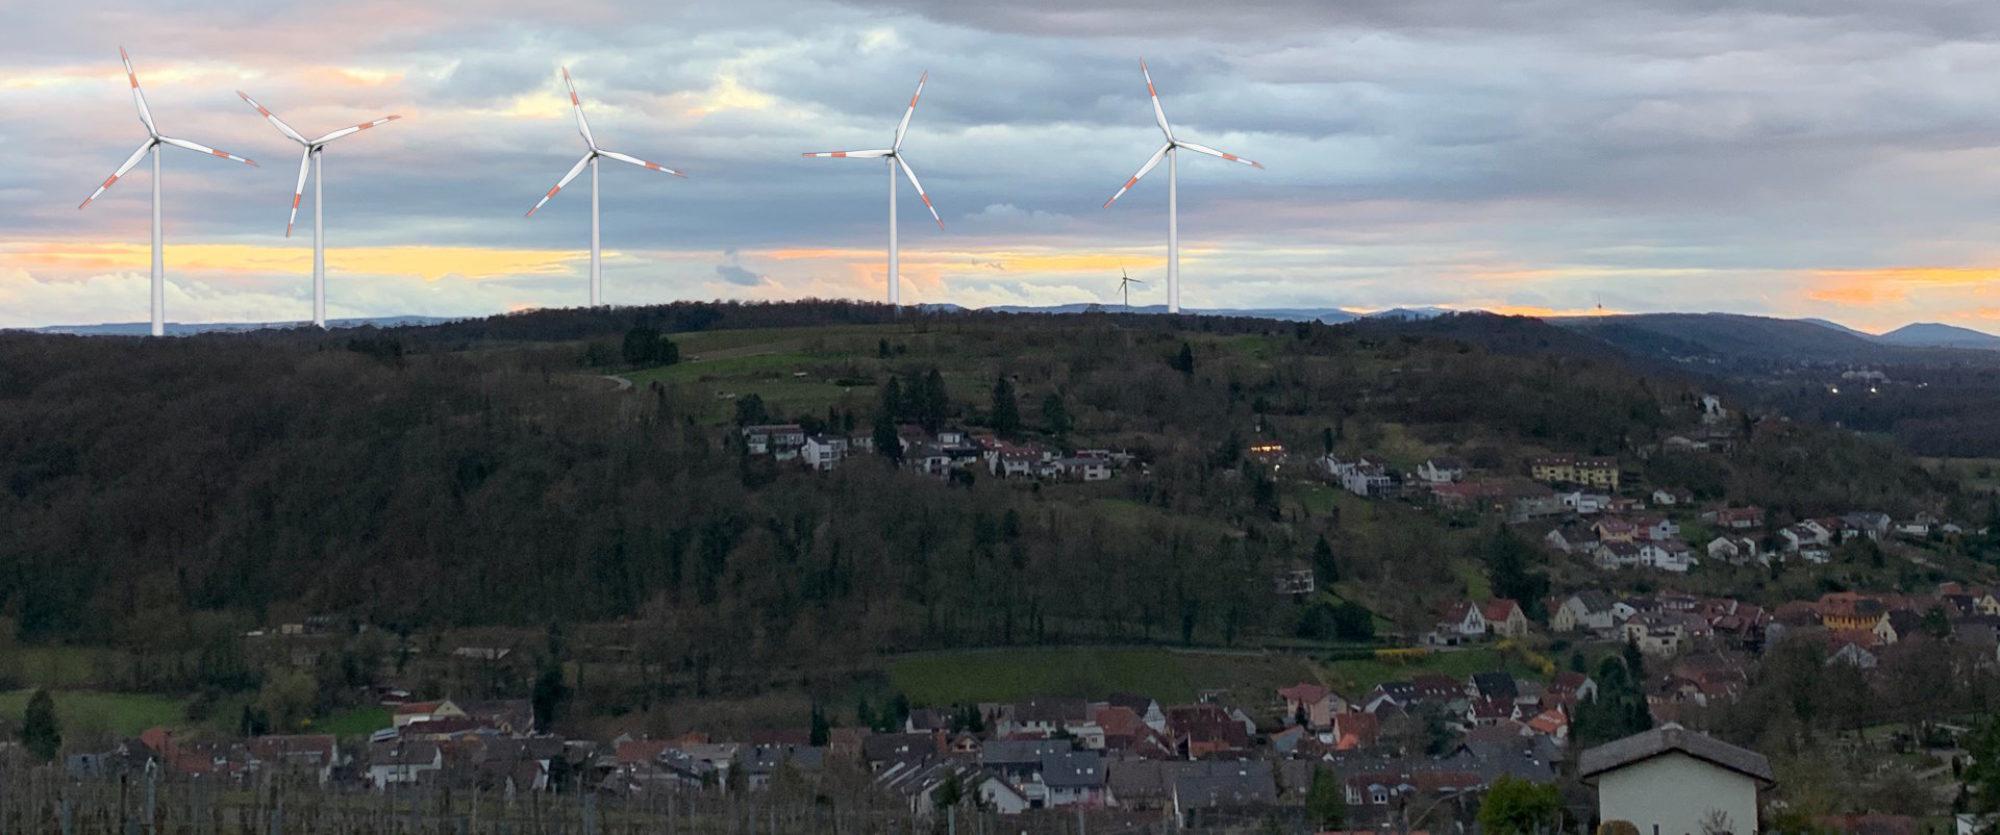 Gegenwind Obergrombach – Helmsheim – Kraichgau e. V.